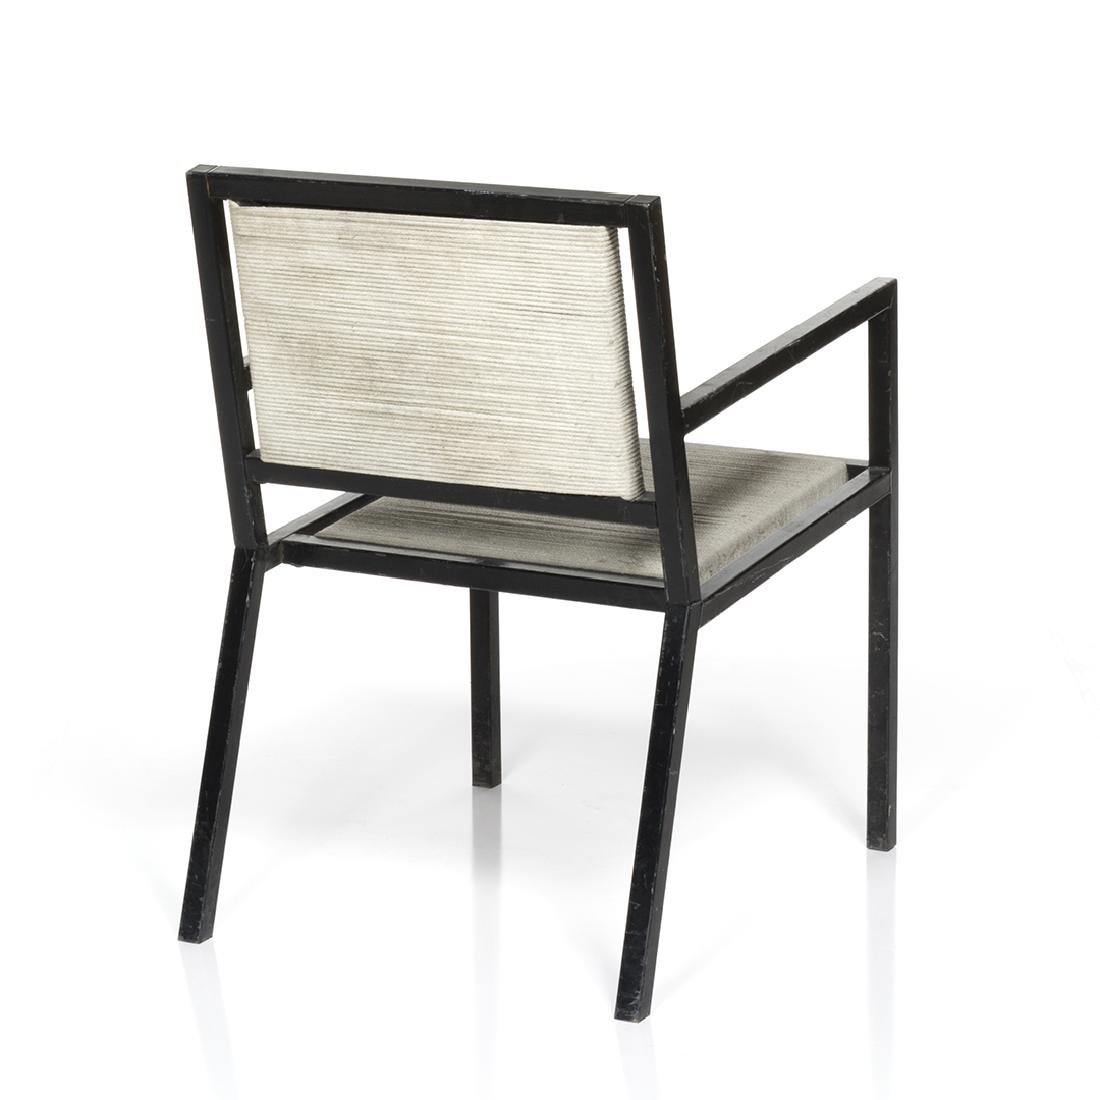 Van Keppel and Green Armchair - 4